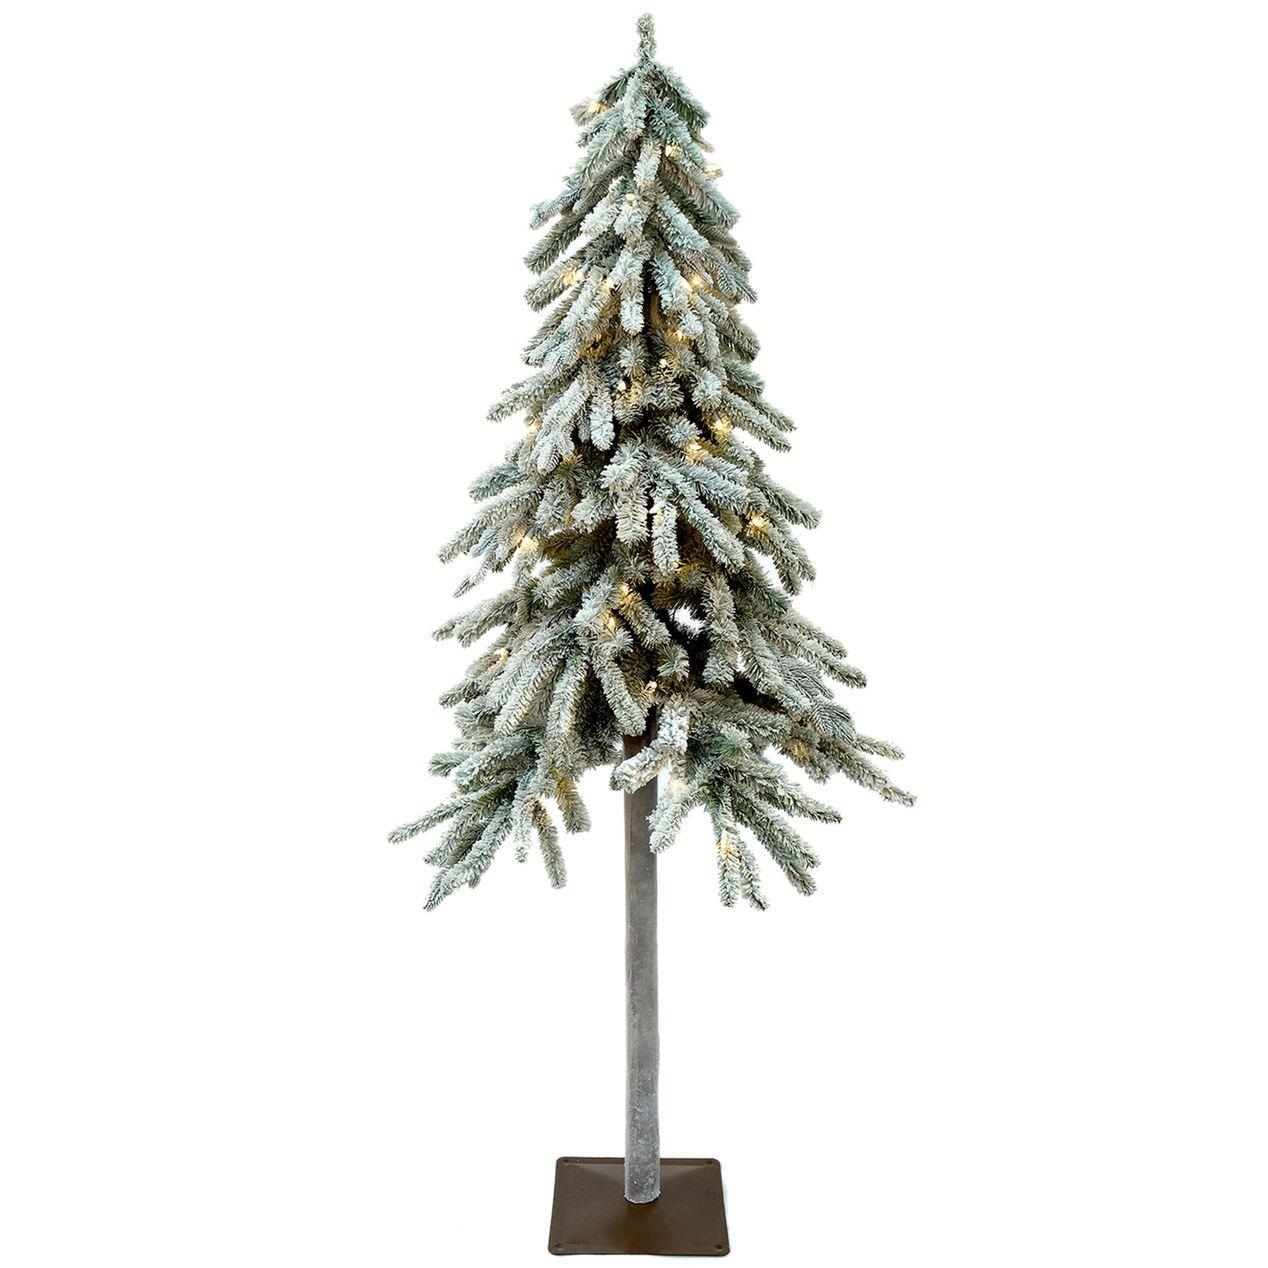 Sl9 6ft Pre Lit Crawley Flocked Christmas Tree At Home Flocked Christmas Trees Christmas Tree Christmas